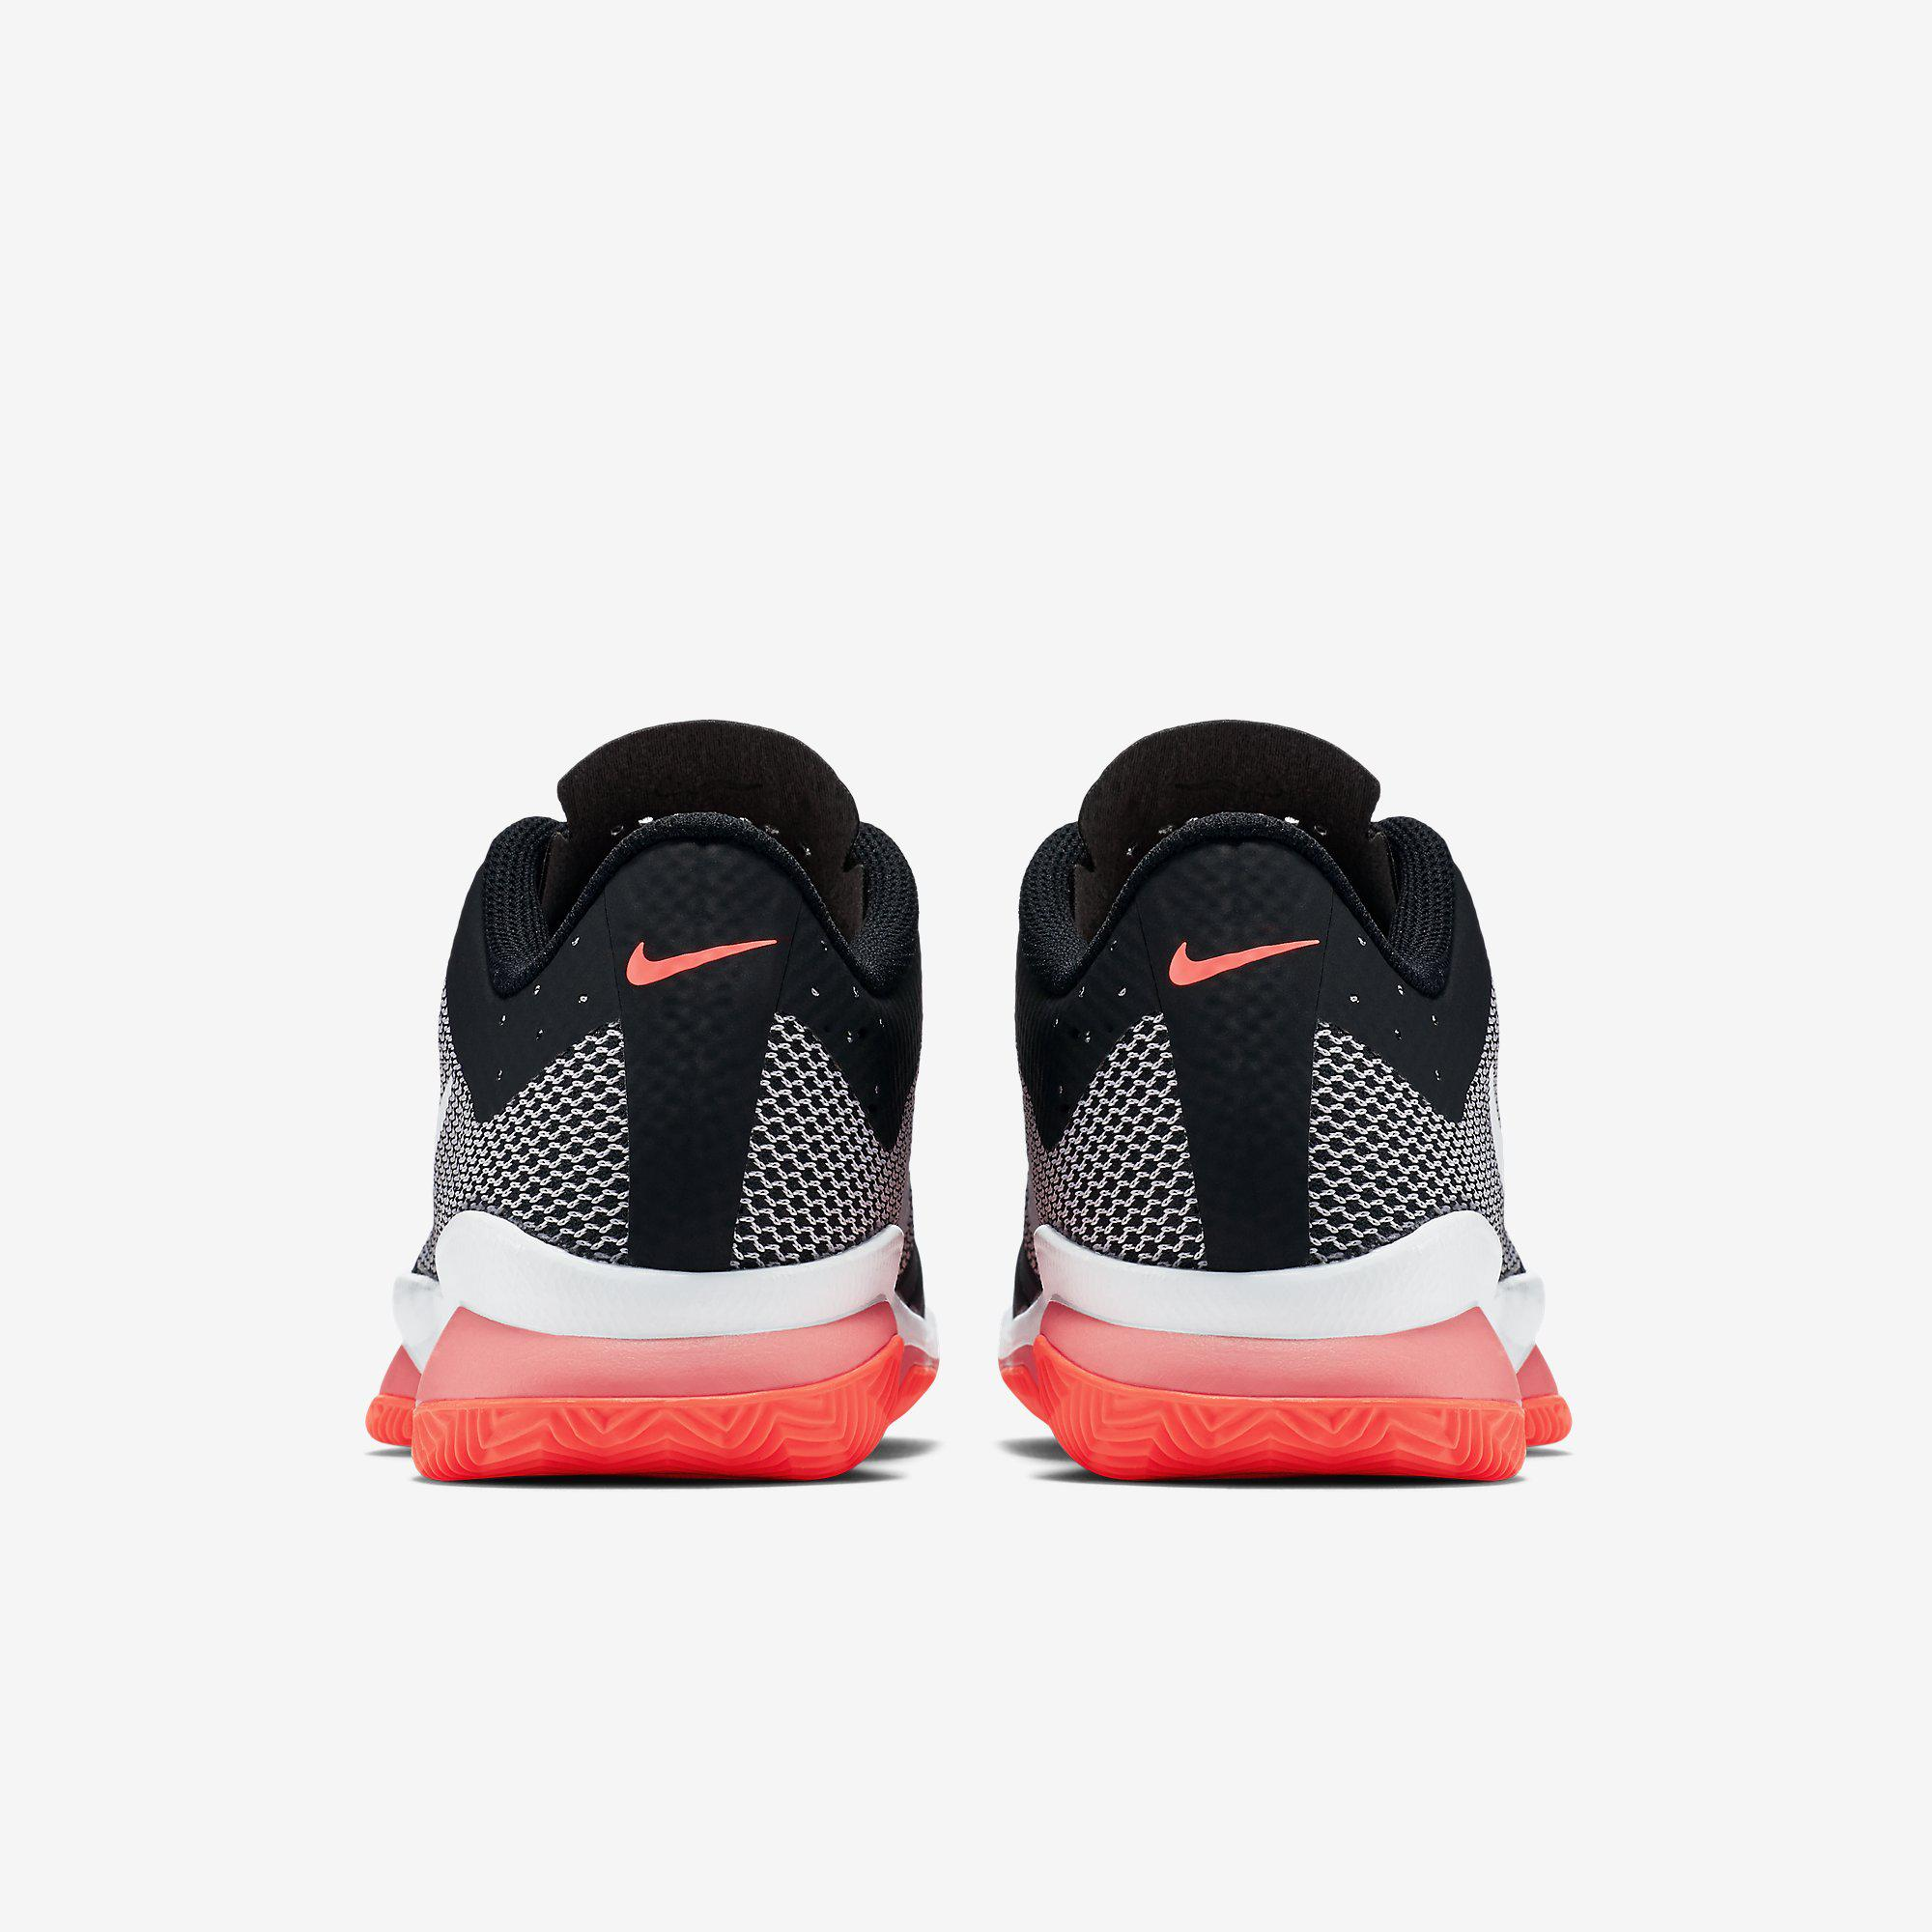 huge discount 3b666 ebd05 Nike Womens Air Zoom Ultra Clay Court Tennis Shoes - Black/White/Lava Glow